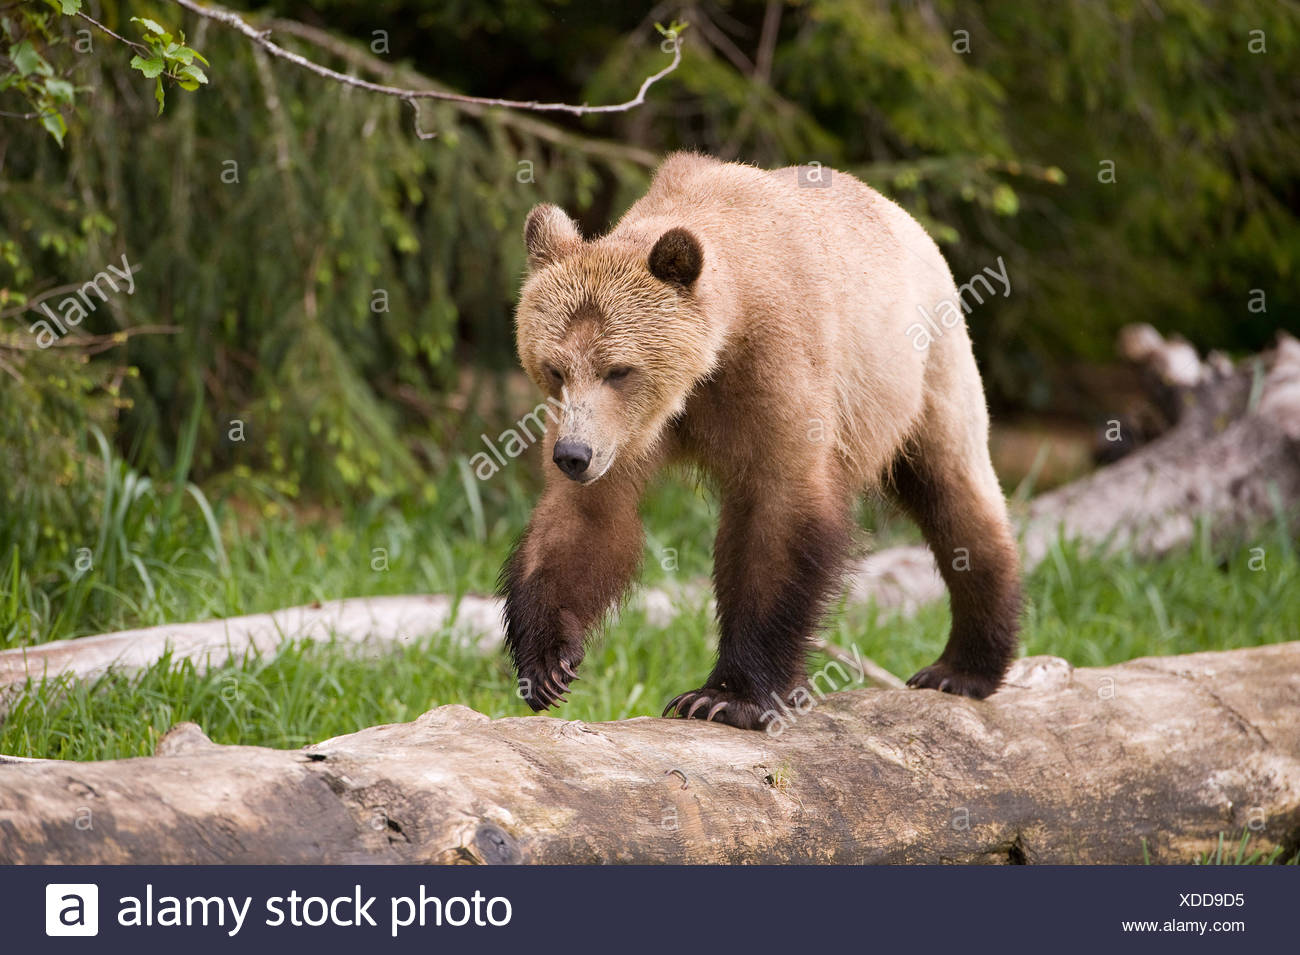 Grizzly bear Ursus arctos horribilis Knight Inlet British Columbia - Stock Image